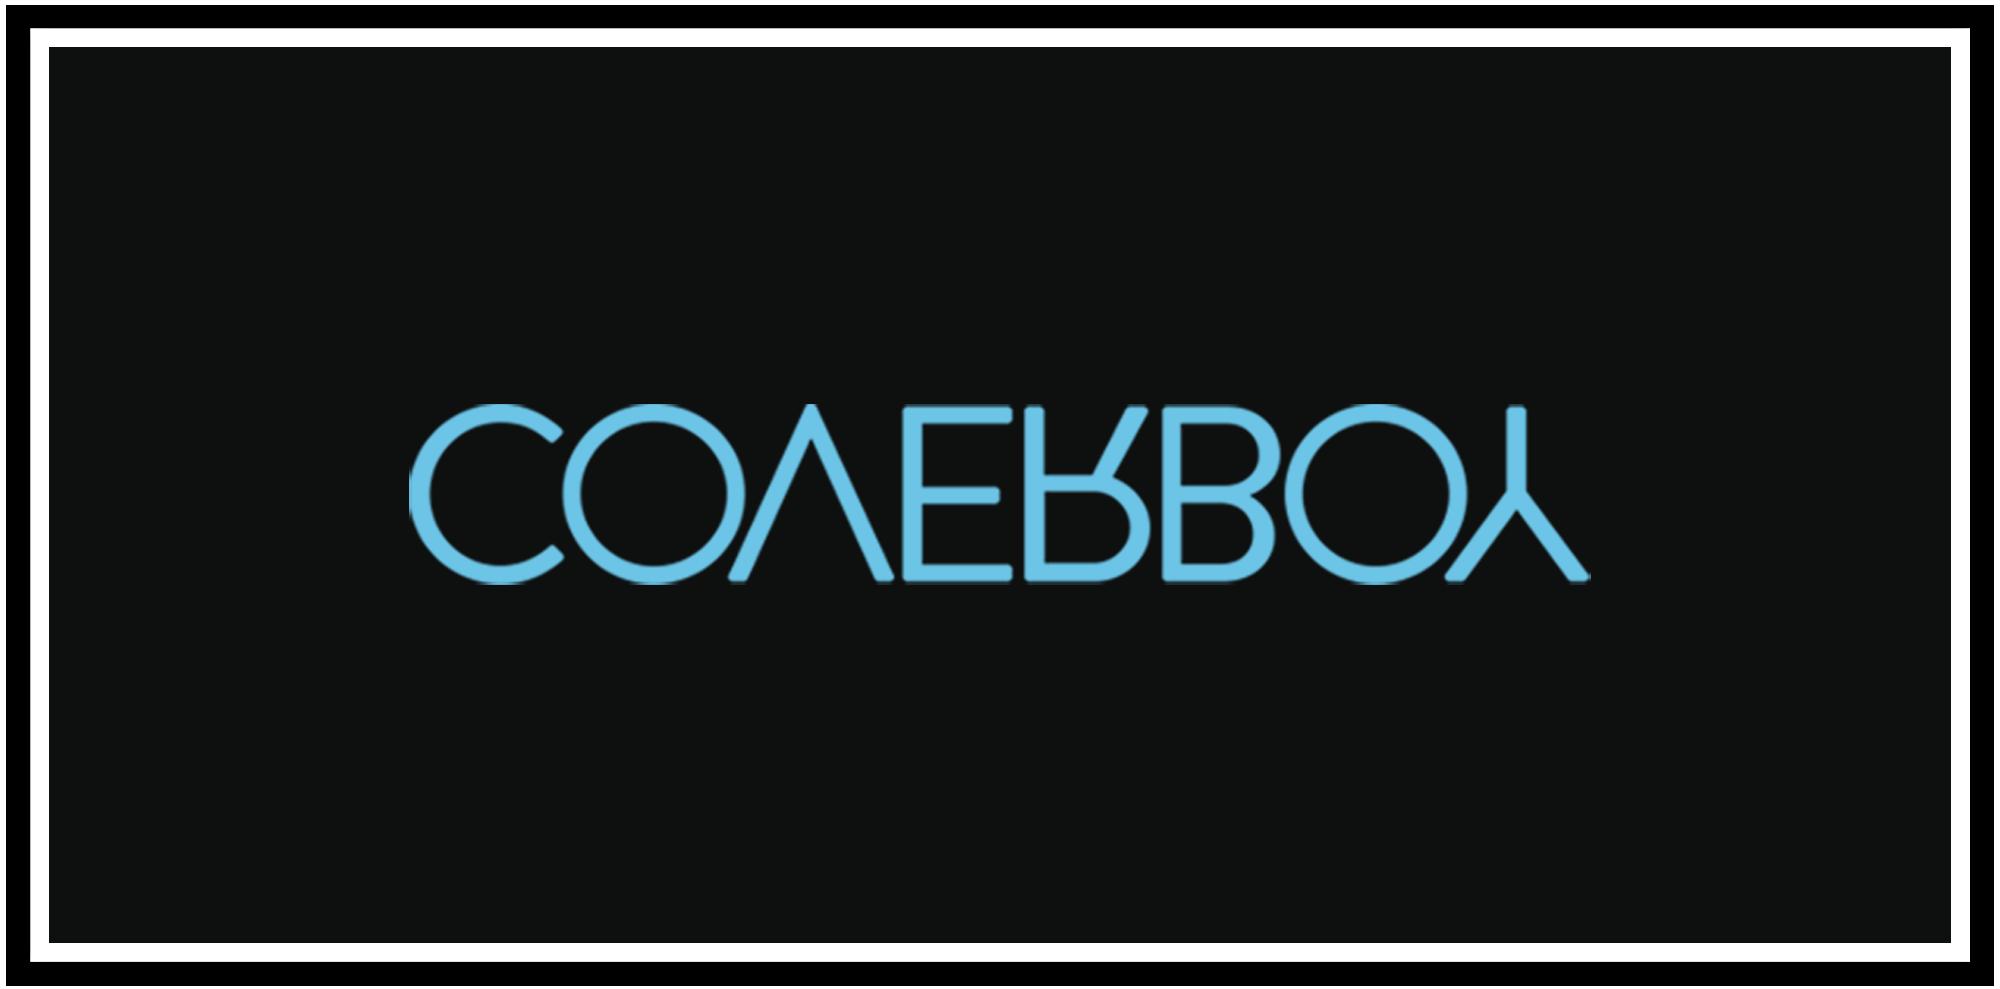 Coverboy-Logos-Trans-Back-(1)